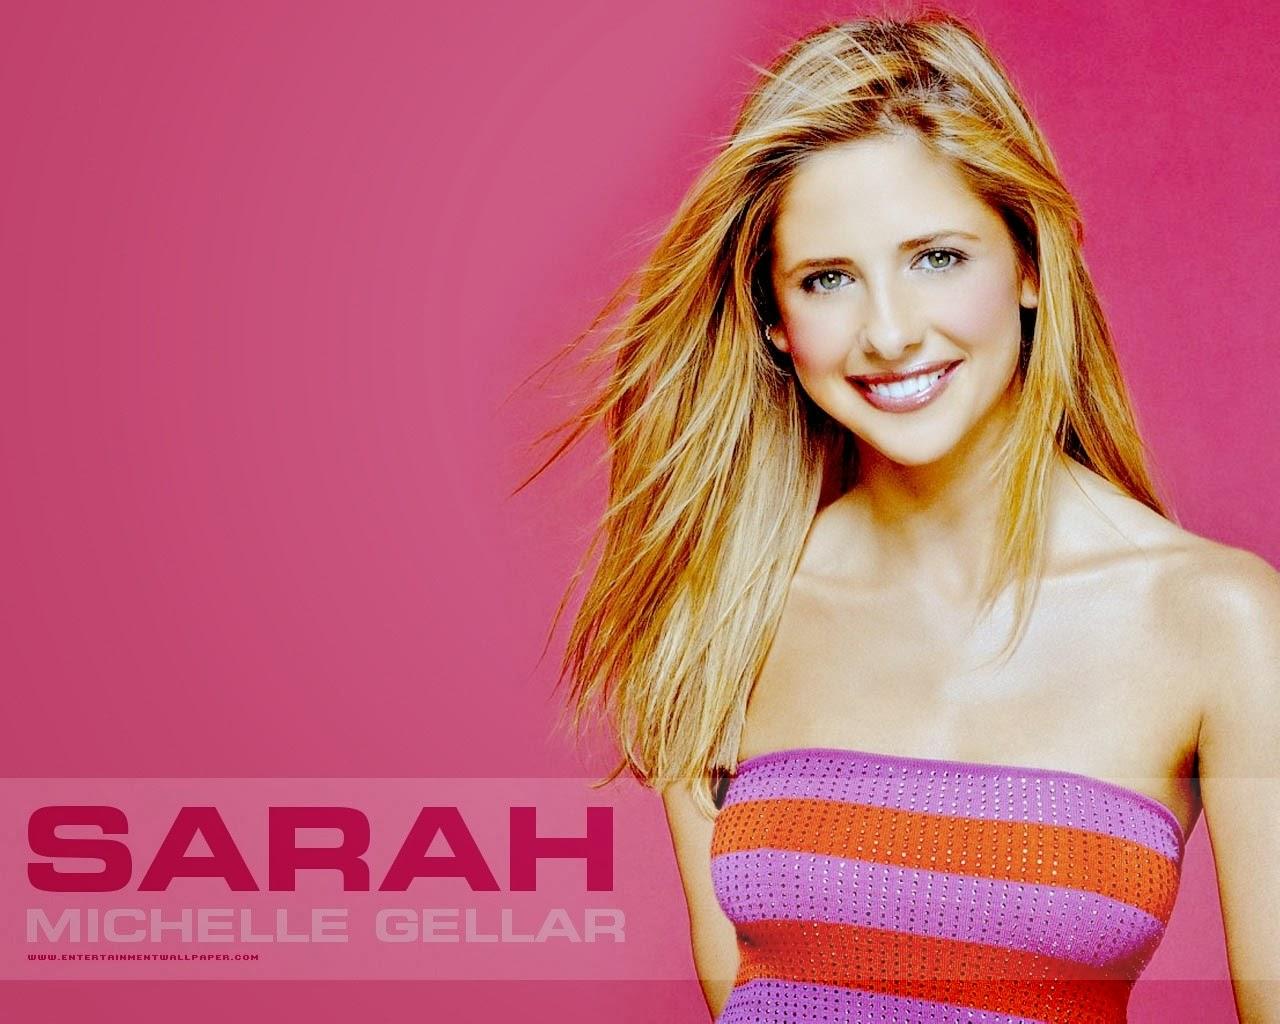 sarah michelle gellar wallpapers hd wallpapers blog